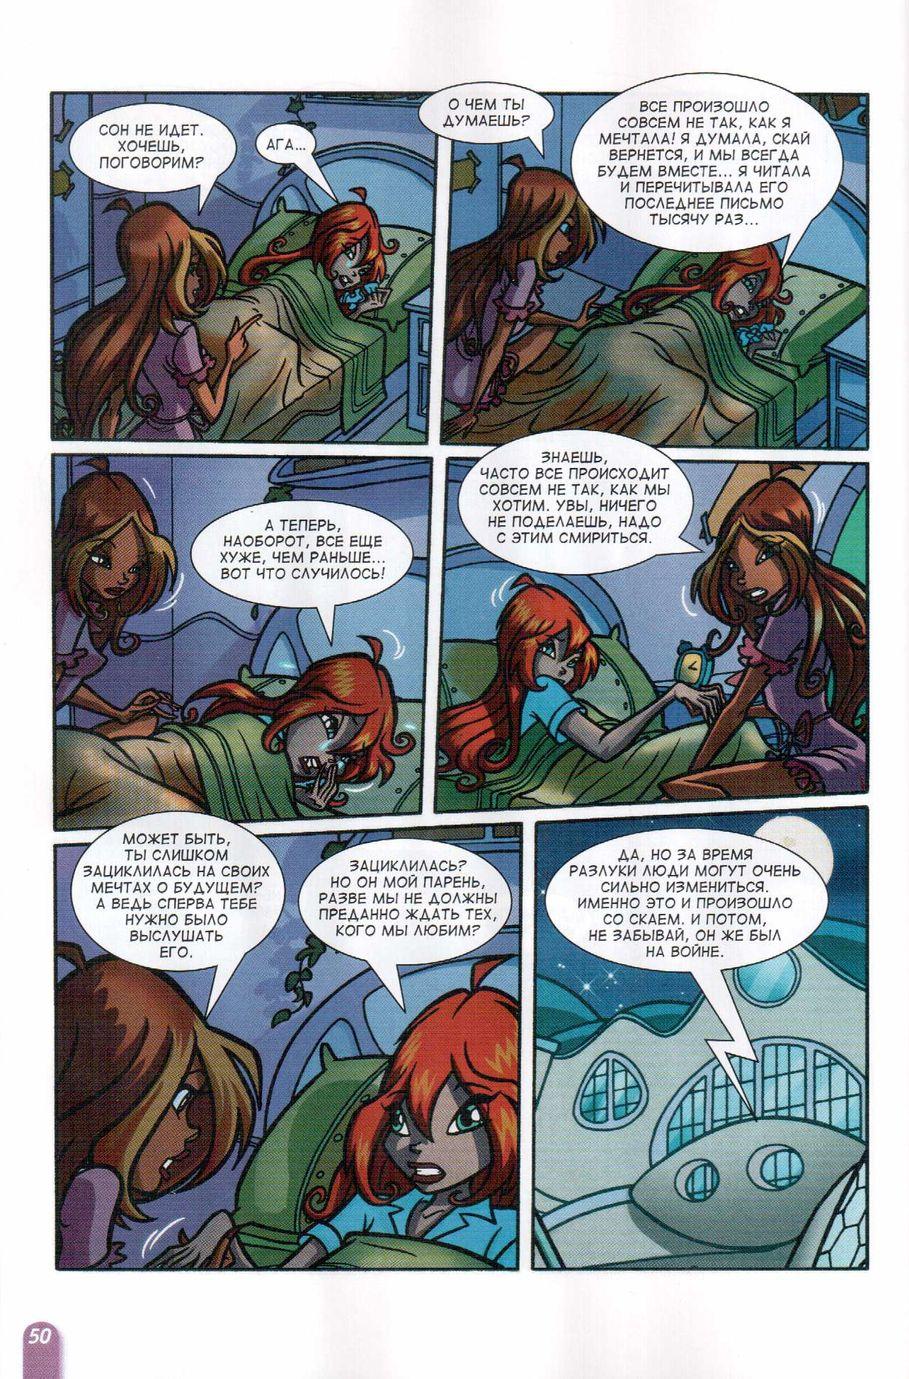 Комикс Винкс Winx - Любовь и ревность (Журнал Винкс №7 2011) - стр. 50